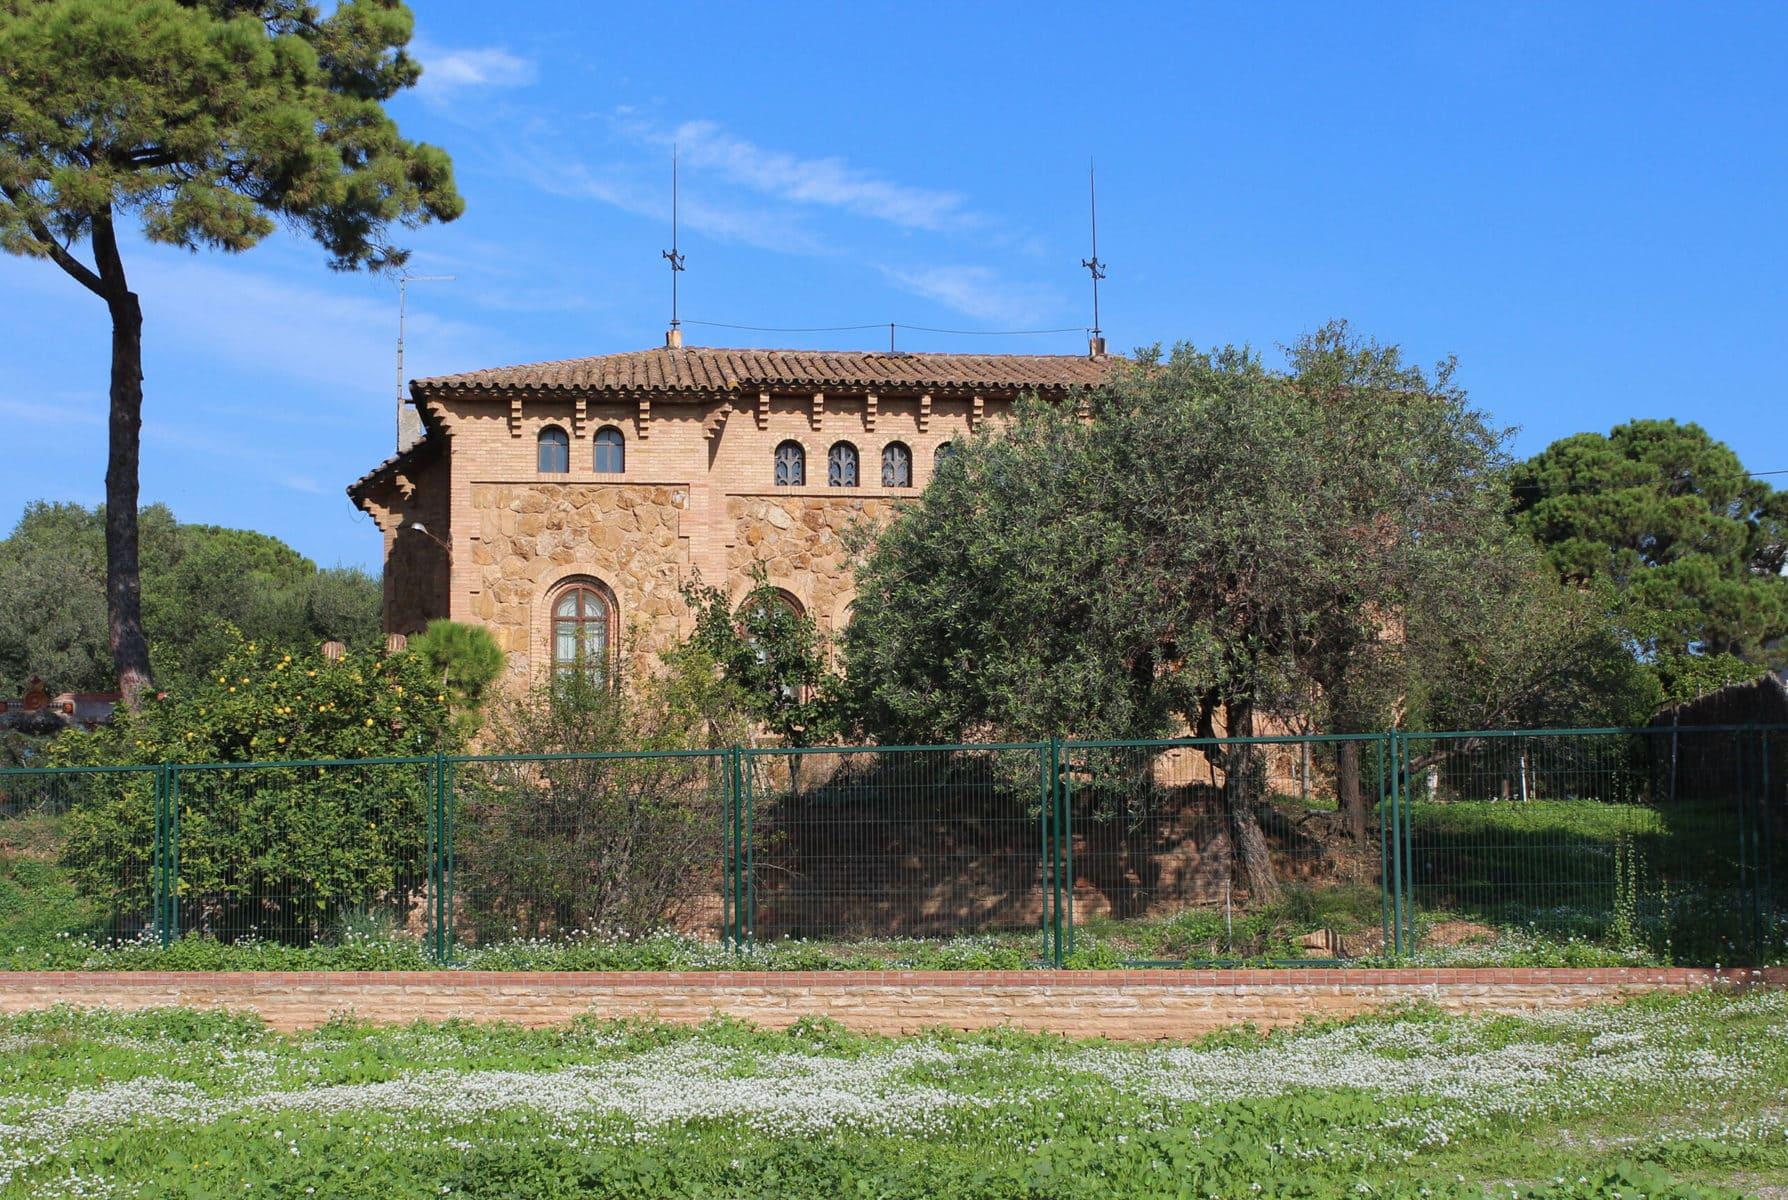 Das ehemalige Pfarrhaus in der Colonia Güell, Barcelona